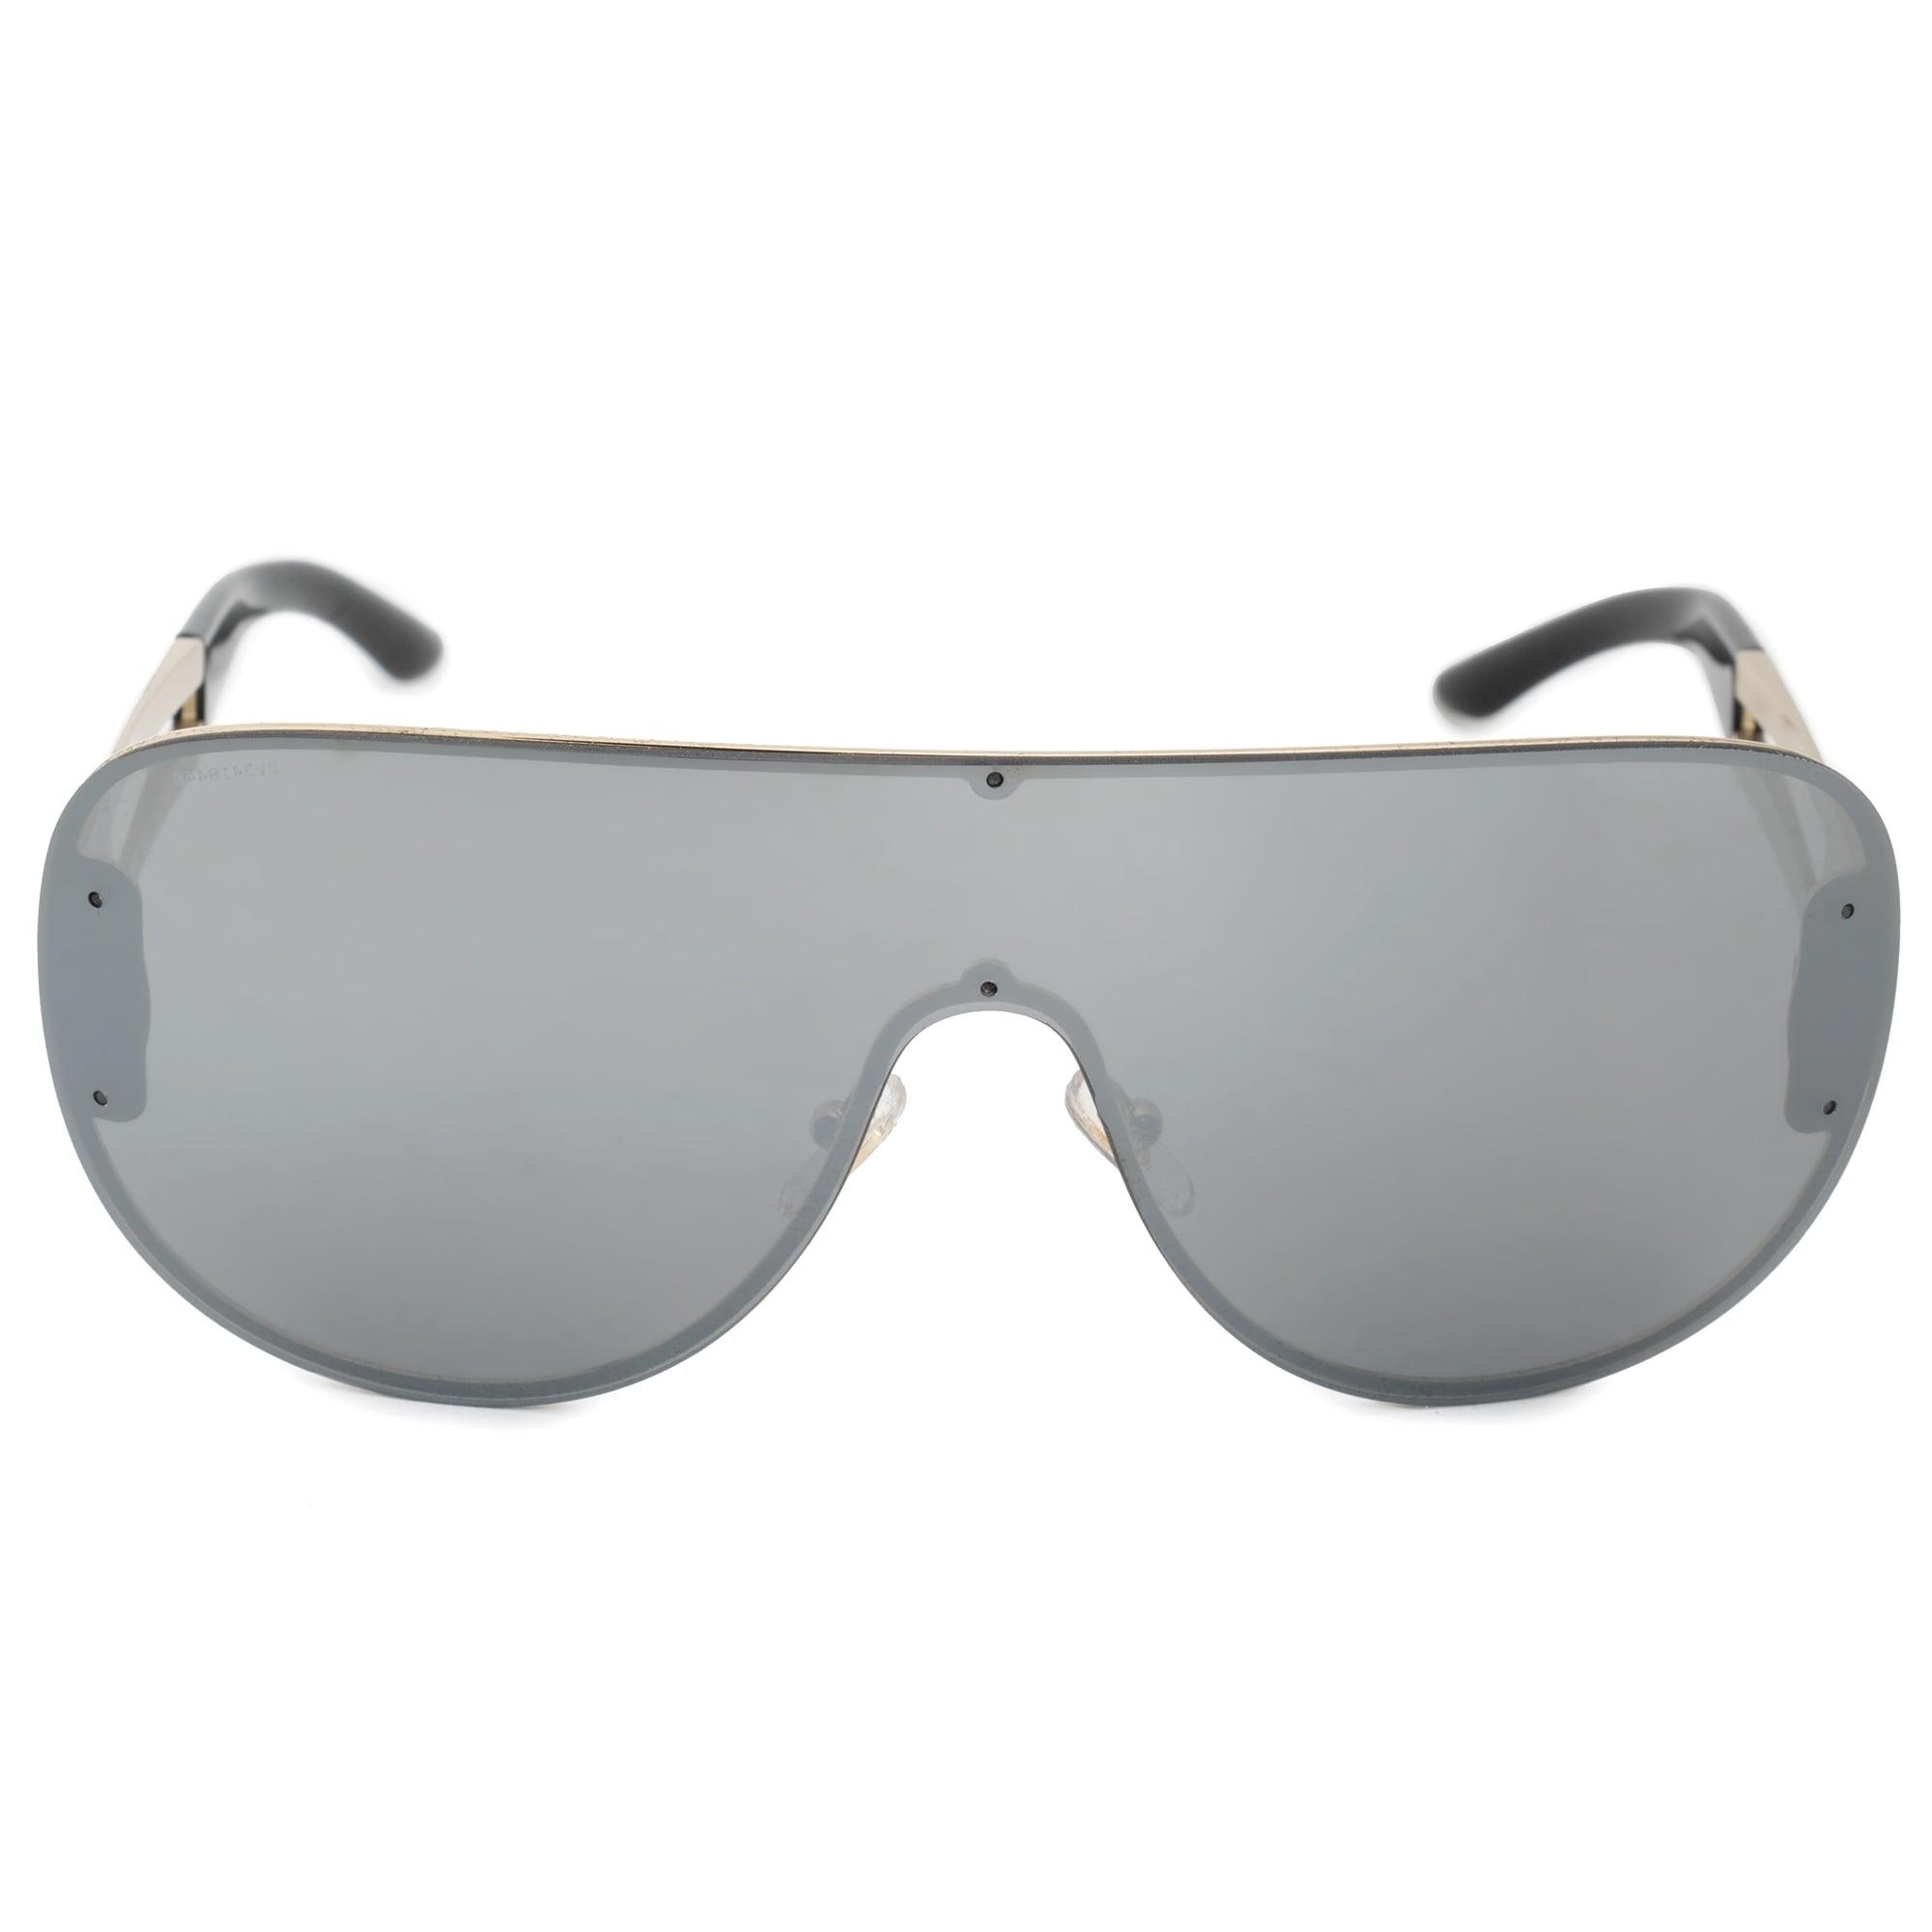 d5948bb1493c4 Shop Versace Shield Sunglasses VE2166 12526G 62 - Free Shipping ...